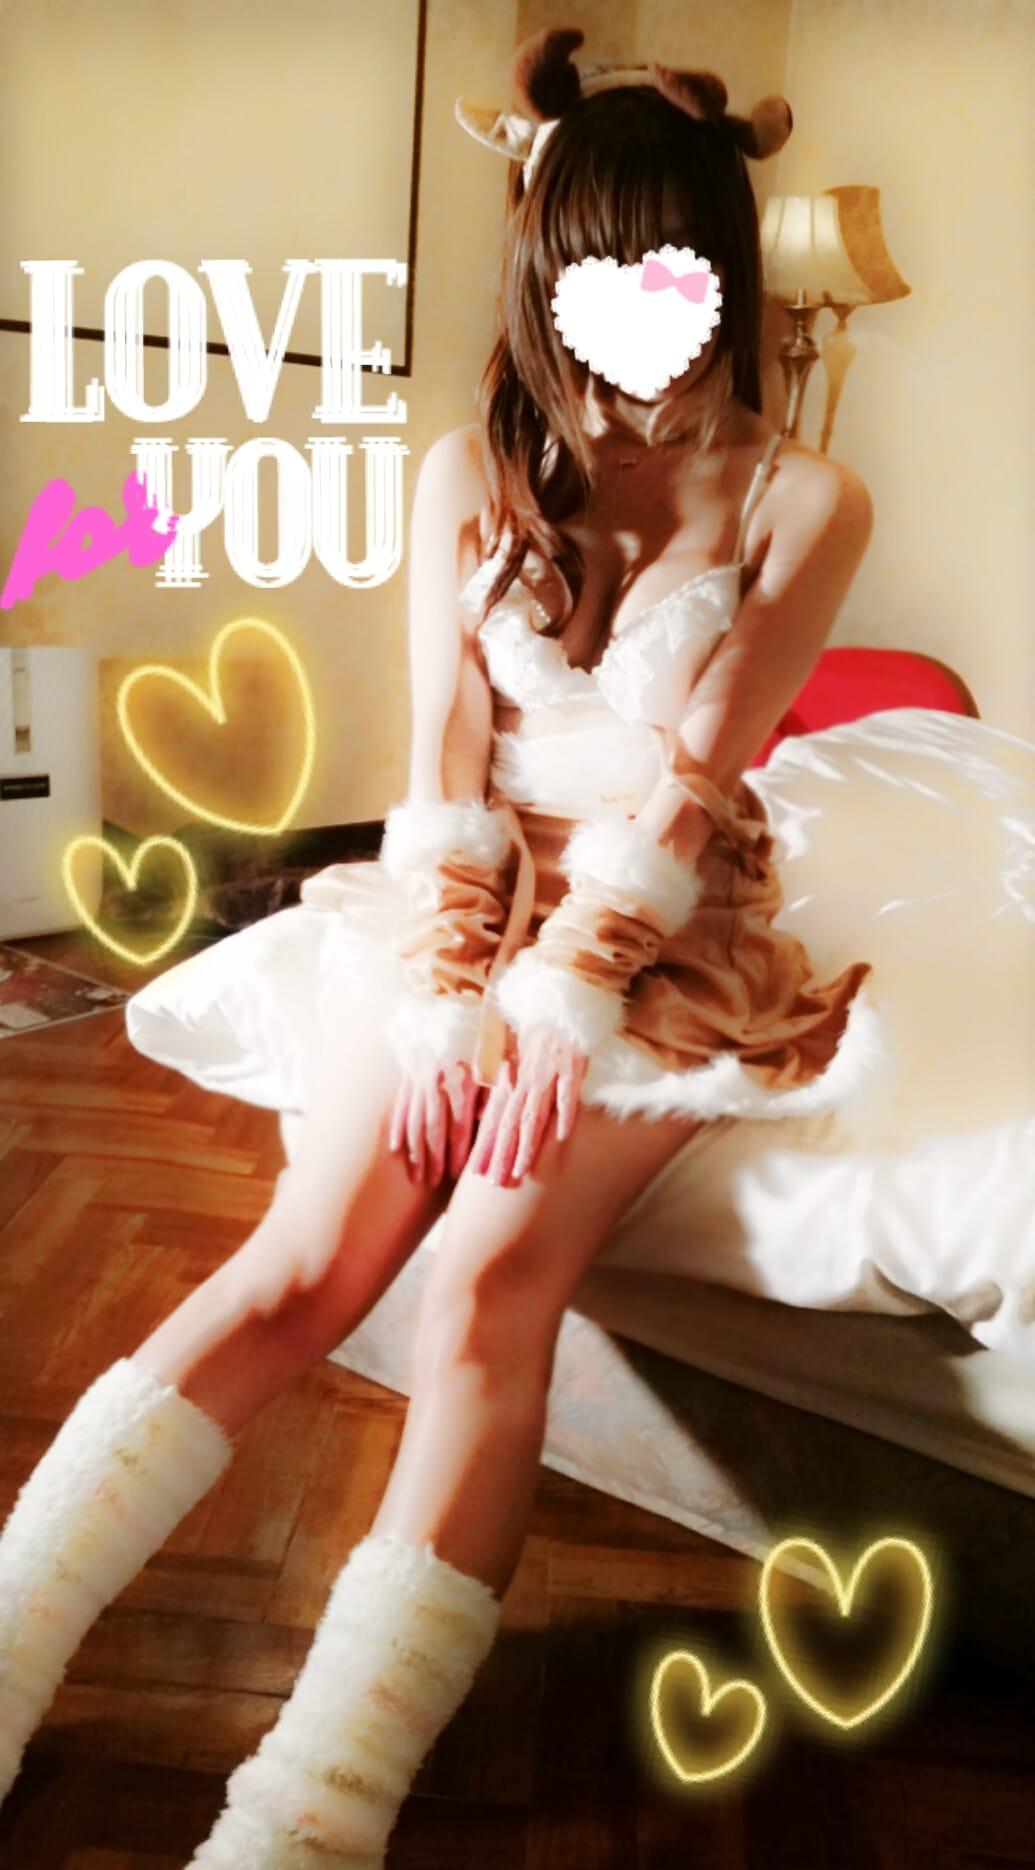 「Eve★log[寒いー♡]」11/18(11/18) 11:59 | イヴの写メ・風俗動画